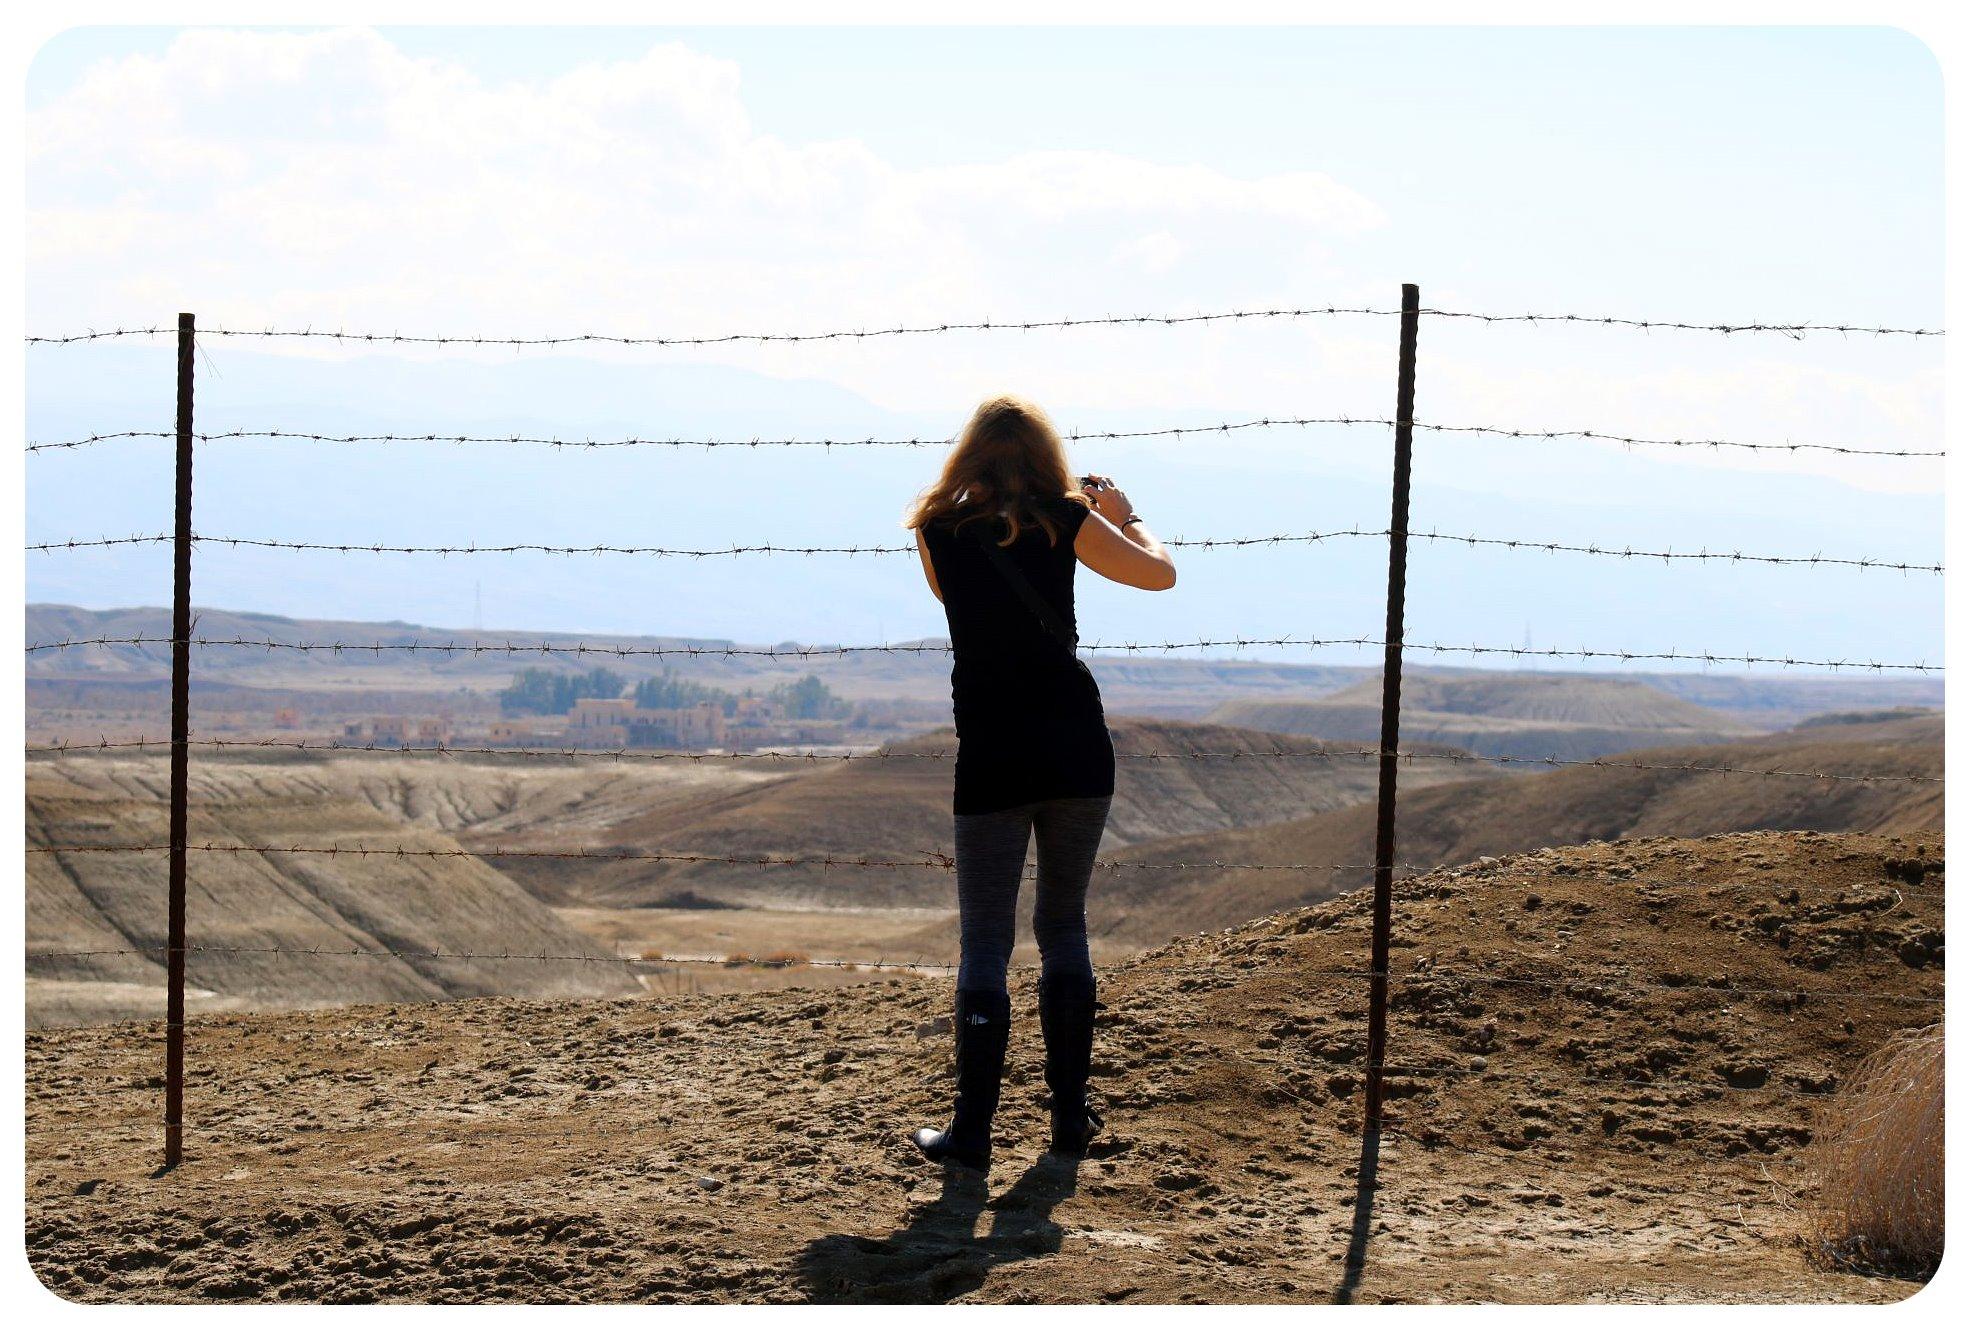 dani israel fence